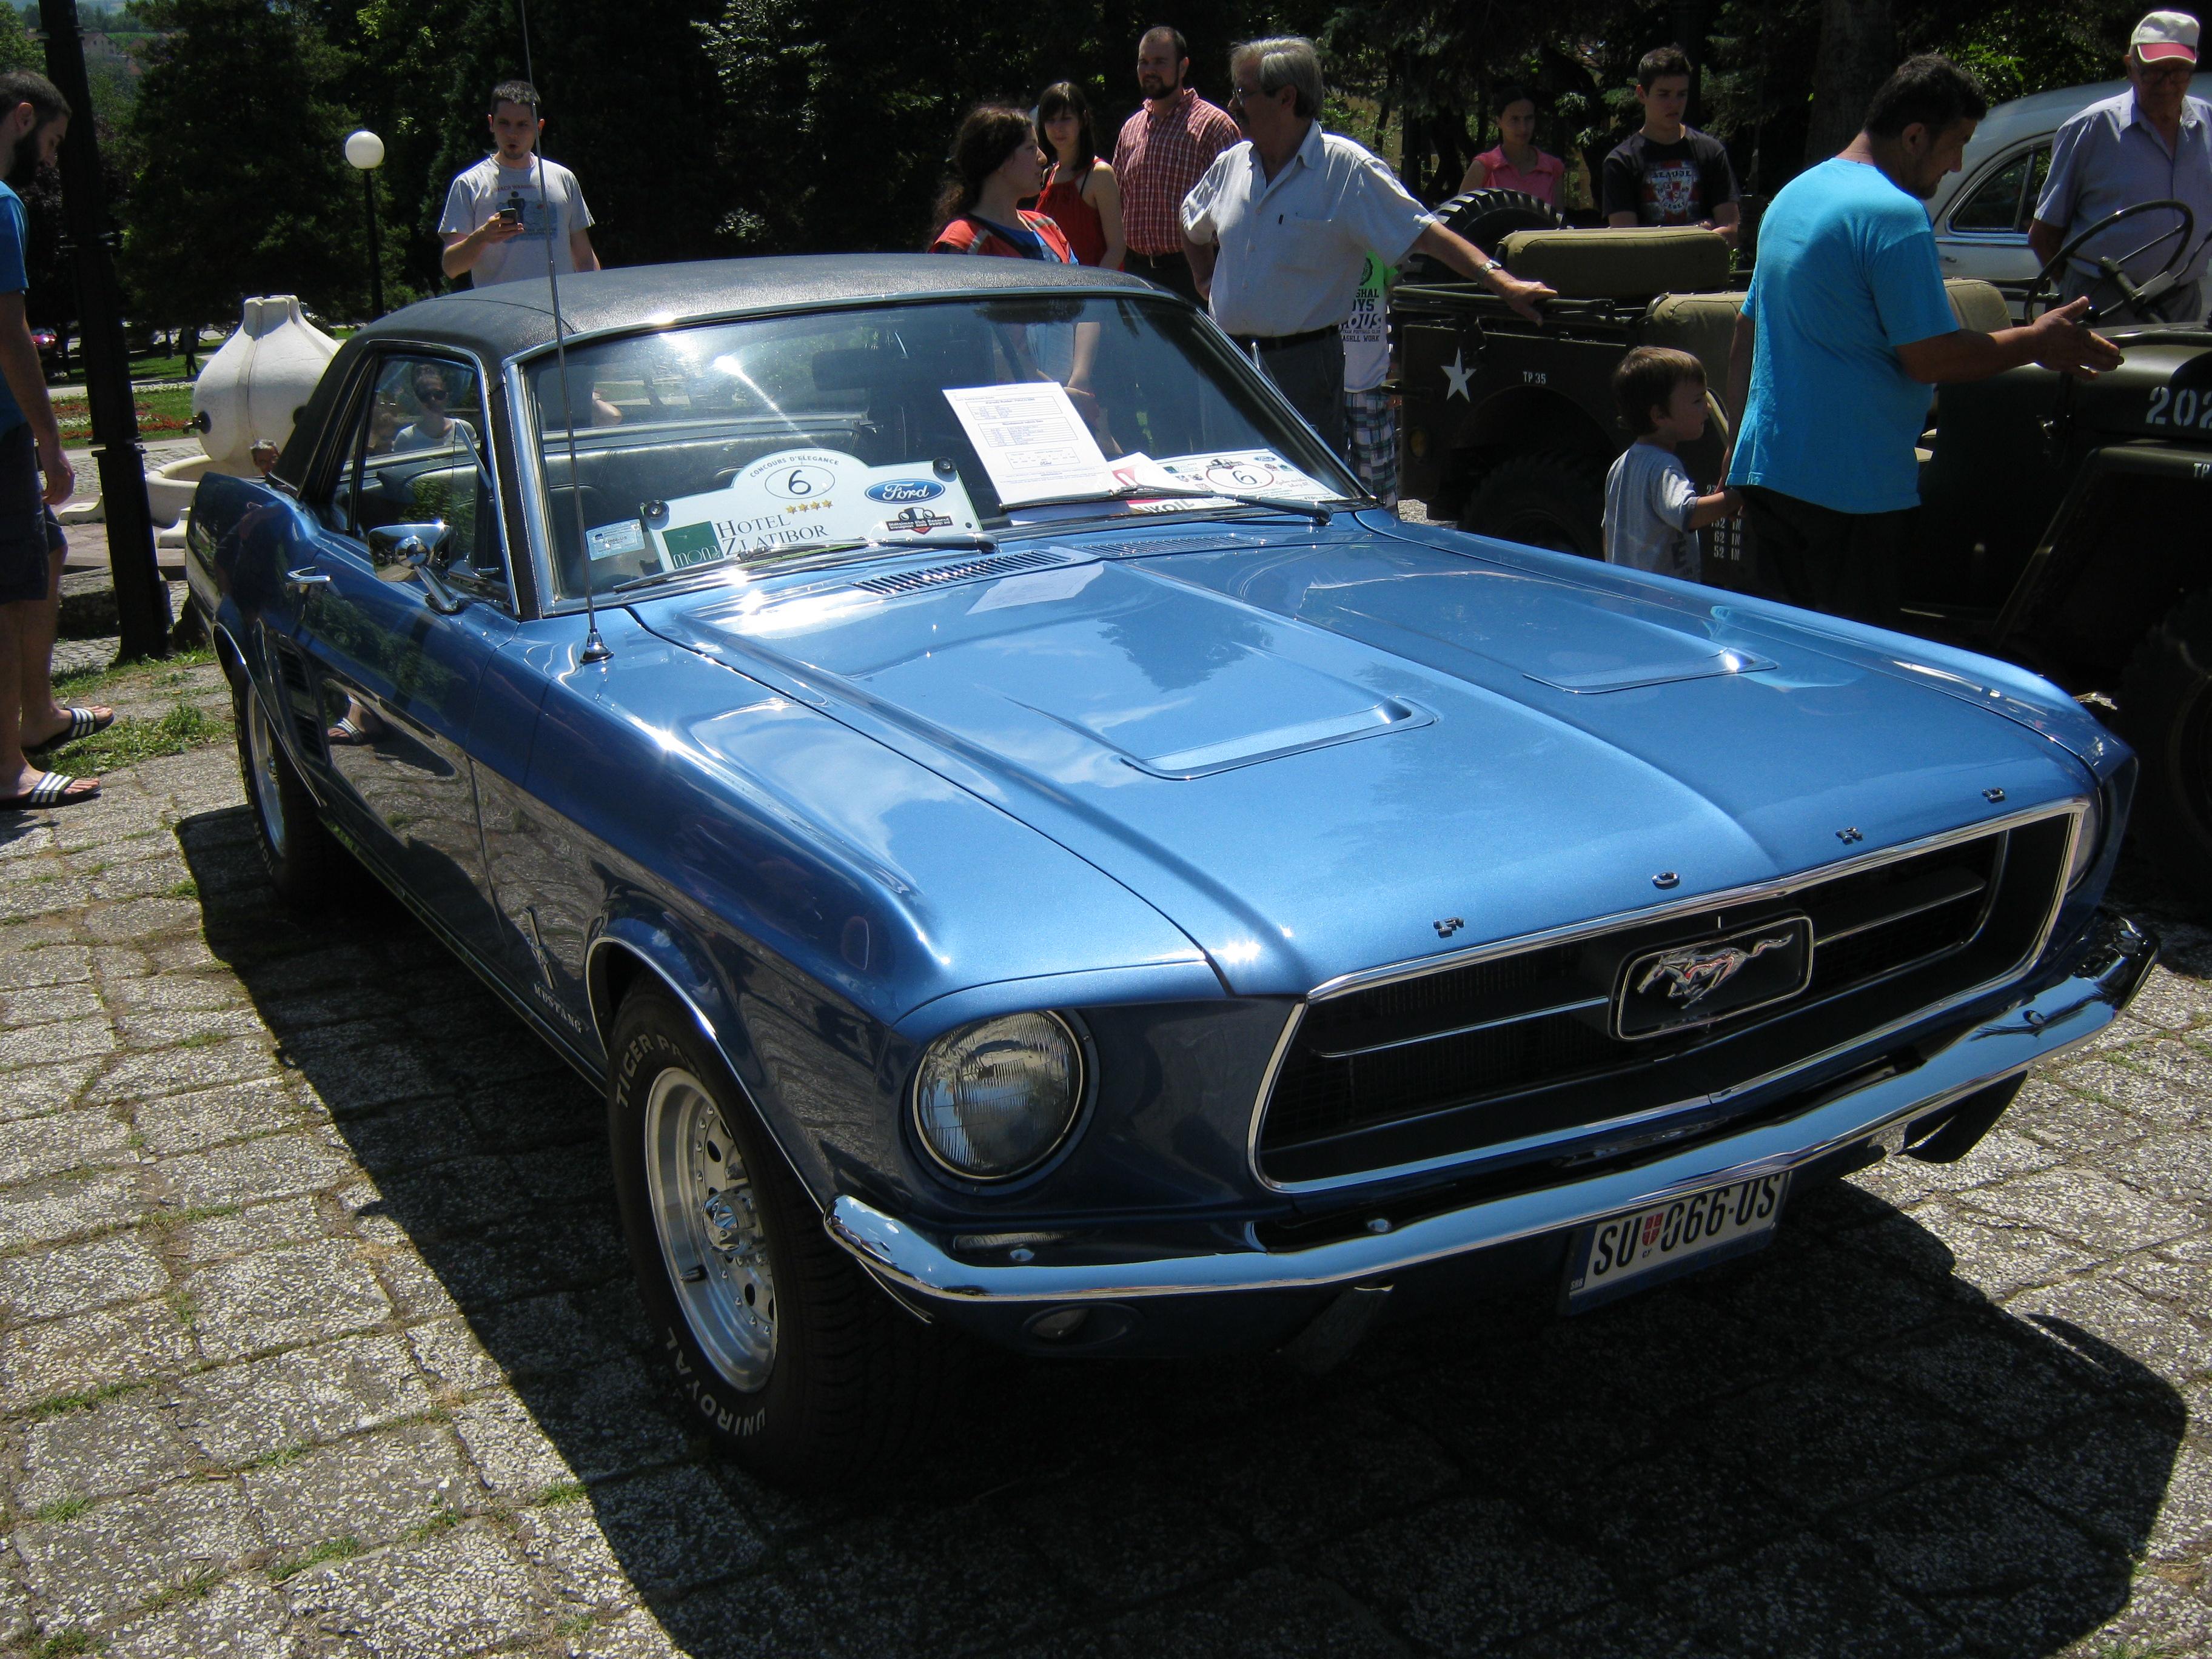 File:1965 Ford Mustang (Gornji Milanovac, Serbia) 06.jpg ...